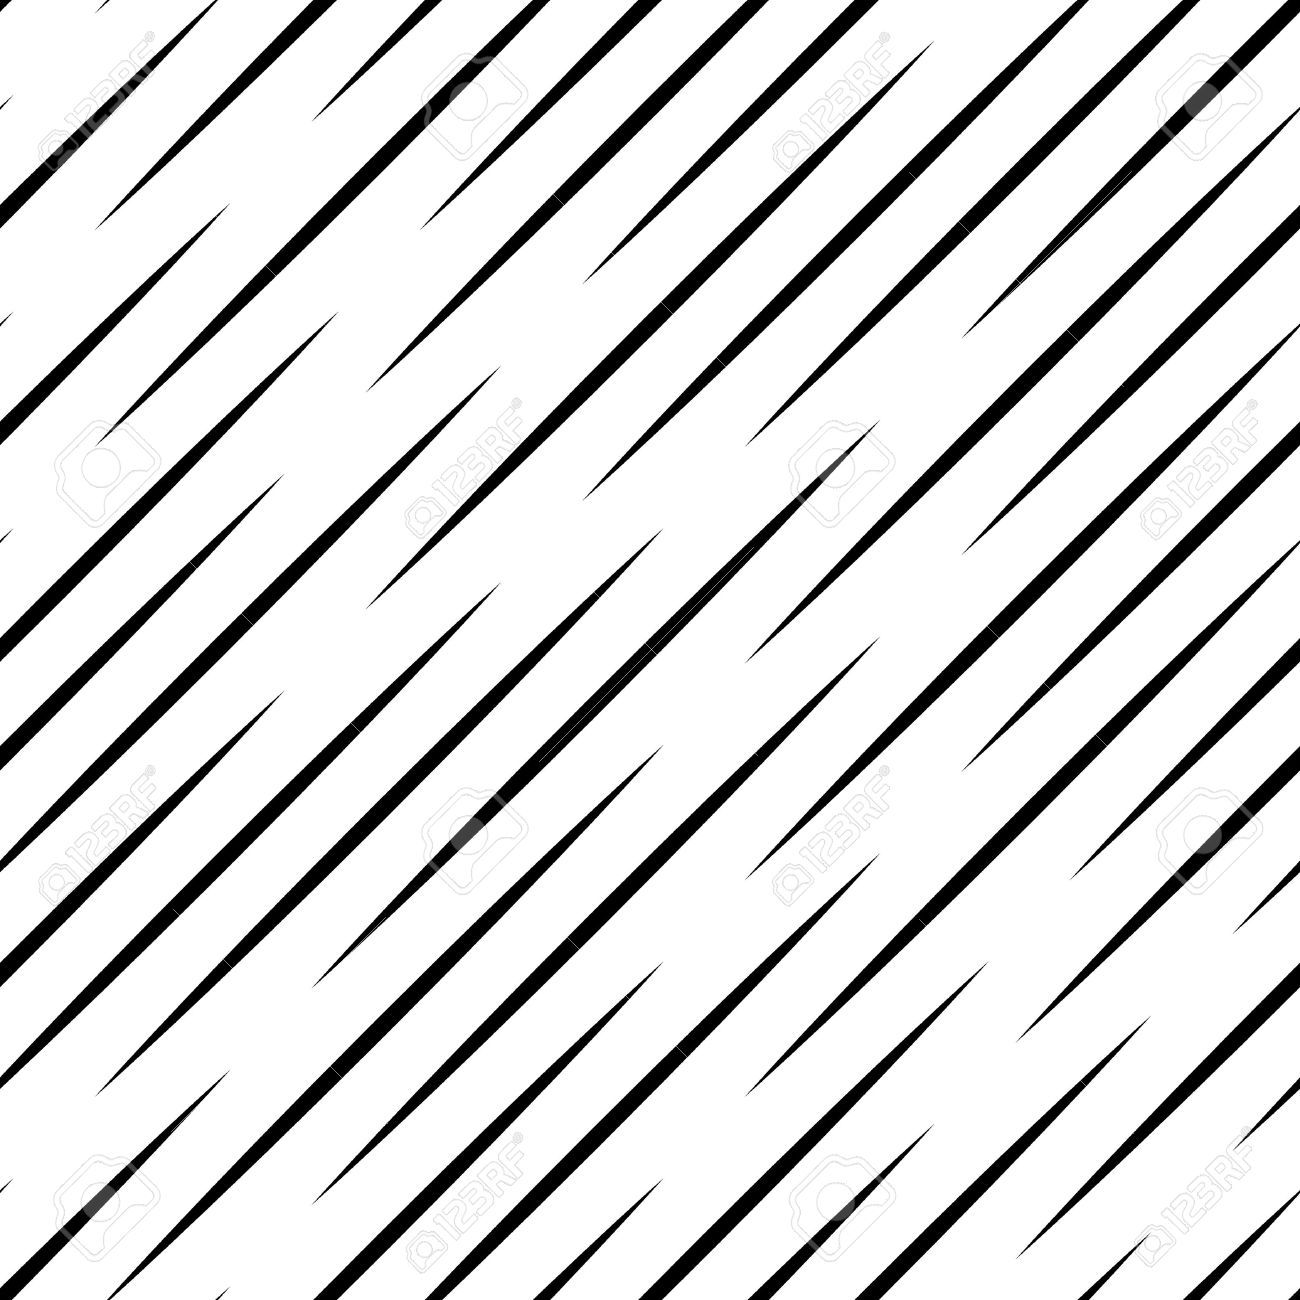 Seamless Diagonal Stripe Pattern Vector Black And White Background Black And White Background Diagonal Stripes Pattern Black And White